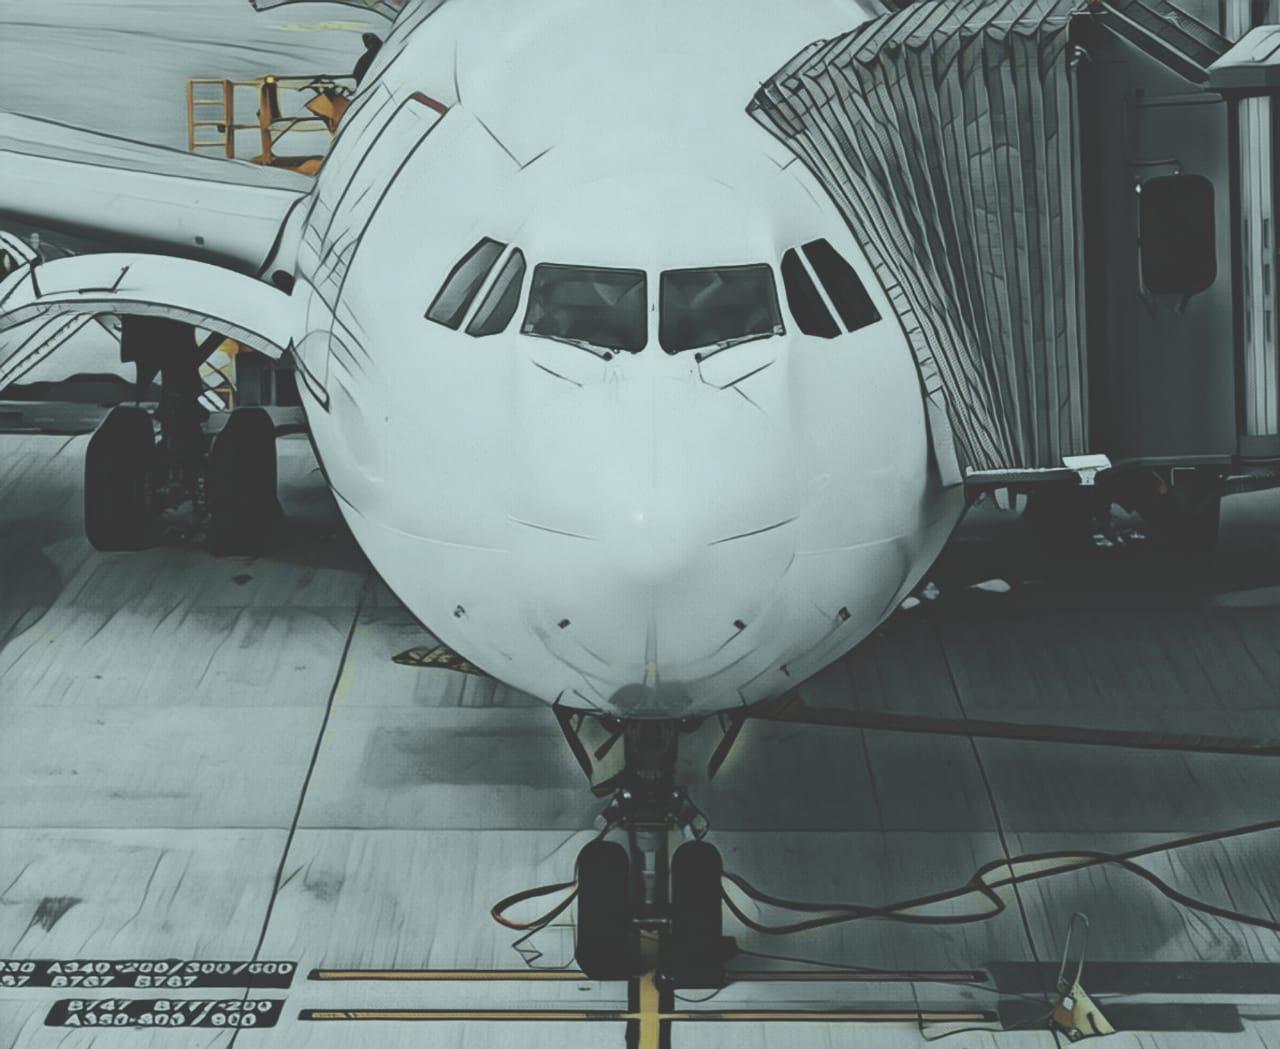 https: img.okezone.com content 2021 01 11 320 2342582 deretan-kecelakaan-pesawat-di-indonesia-sejak-1992-hingga-2018-O0V9UJRmfb.jpeg